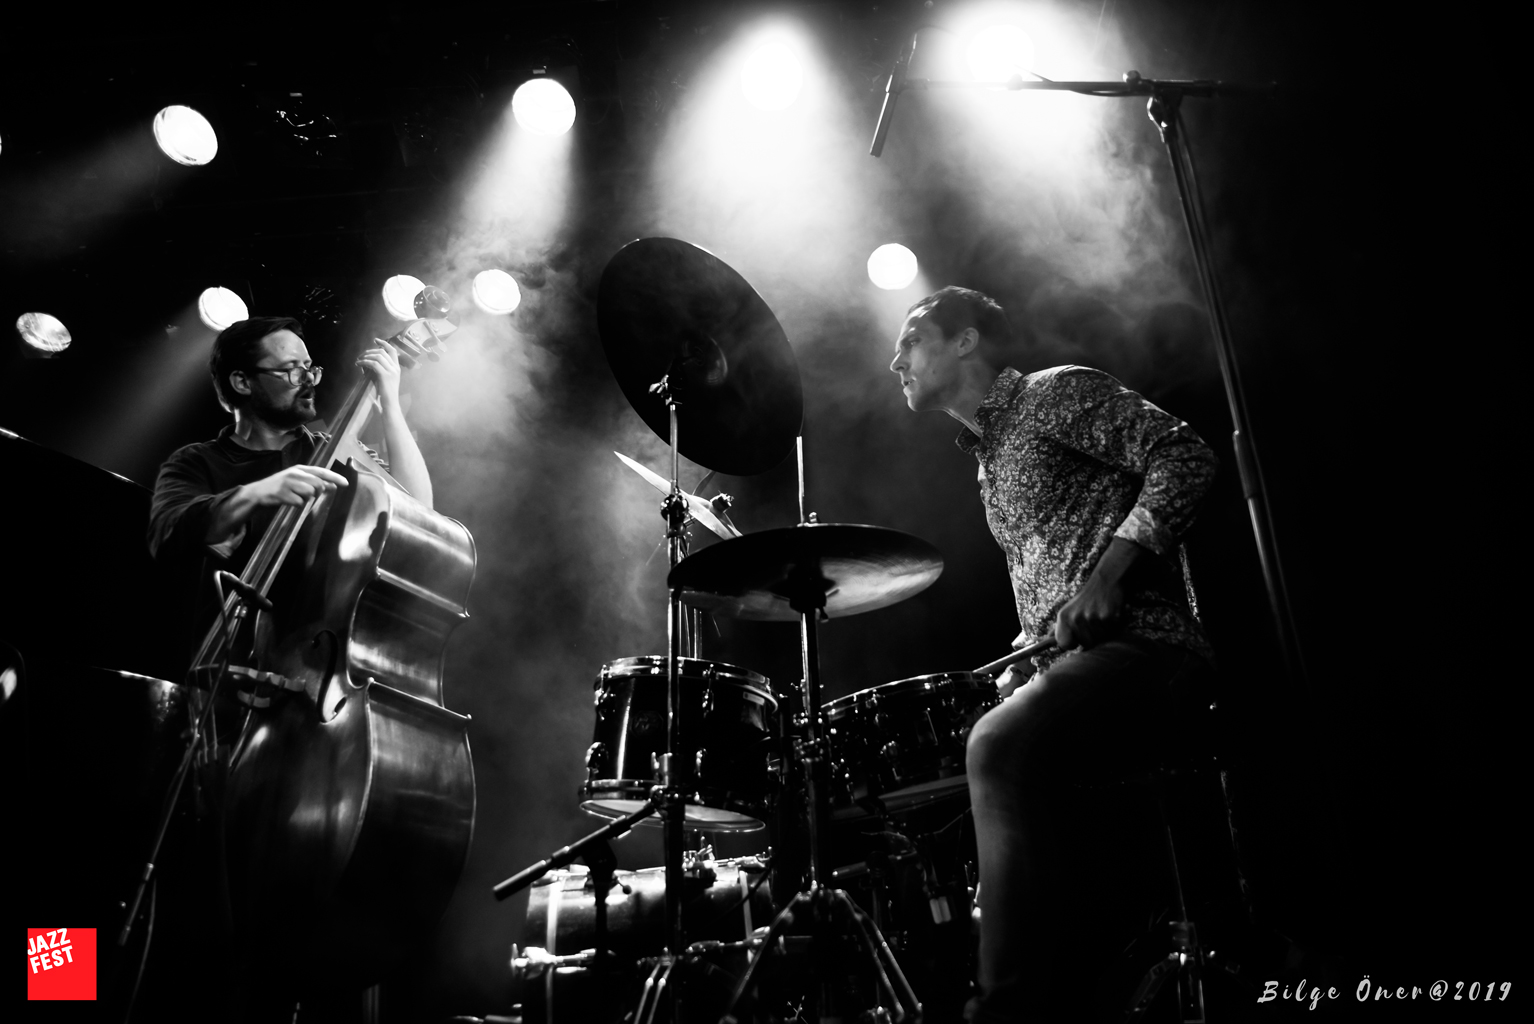 110519-Maria-Kannegaard-Trio-@-Studentsammfunnet-foto-Bilge-Öner-8.jpg